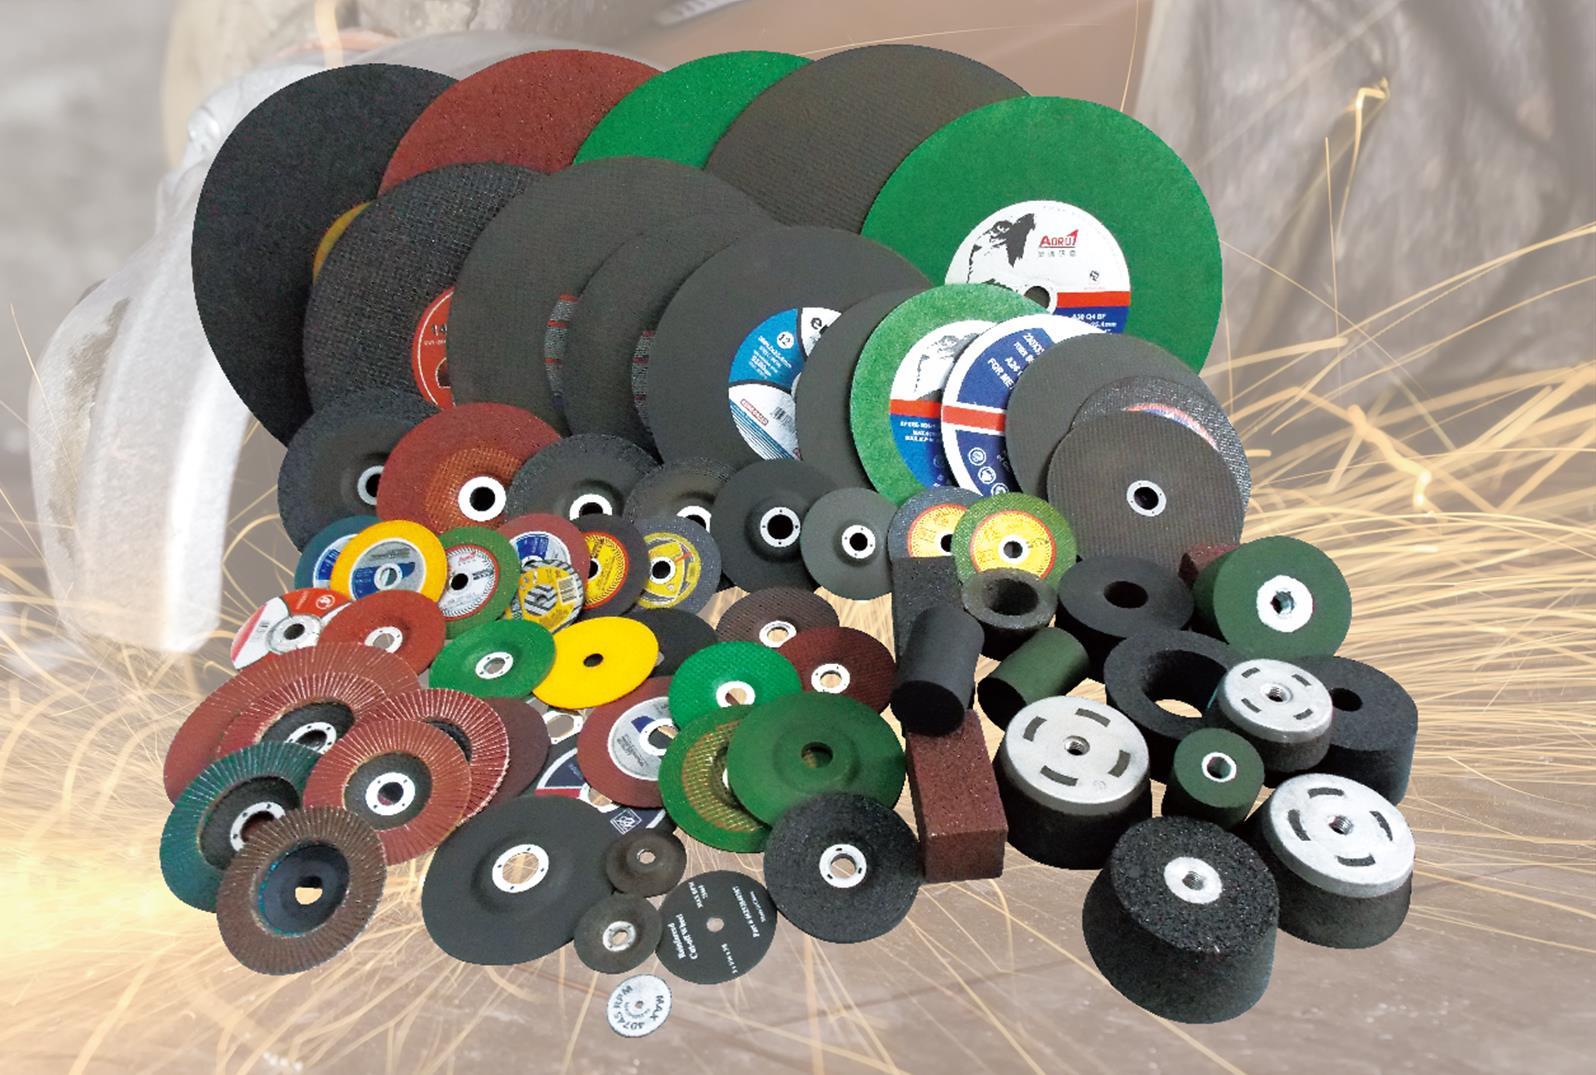 Green Cutting Discs For Inox